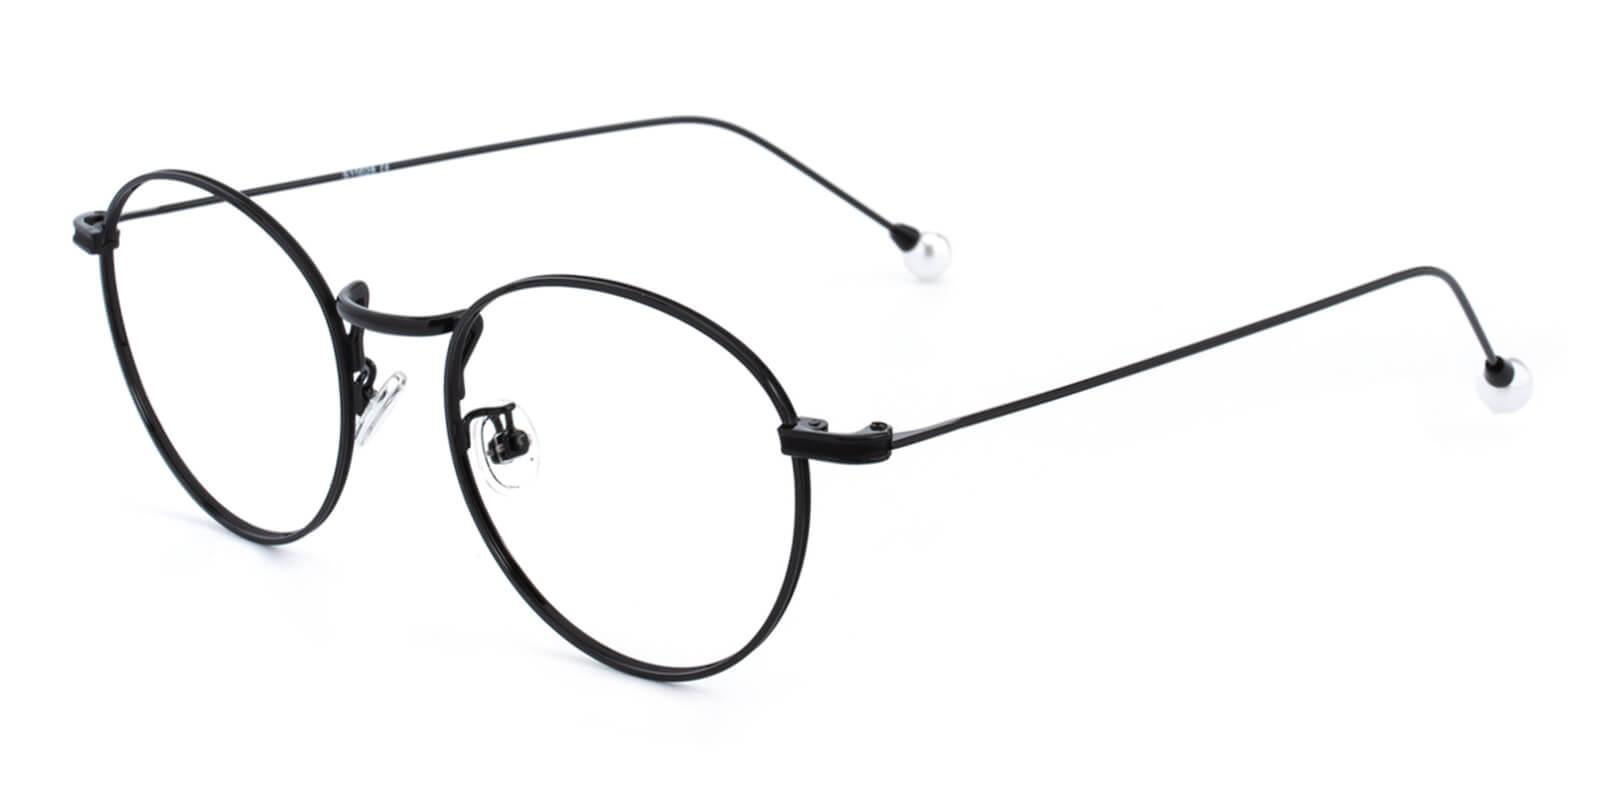 Frail-Black-Round-Metal-Eyeglasses-additional1